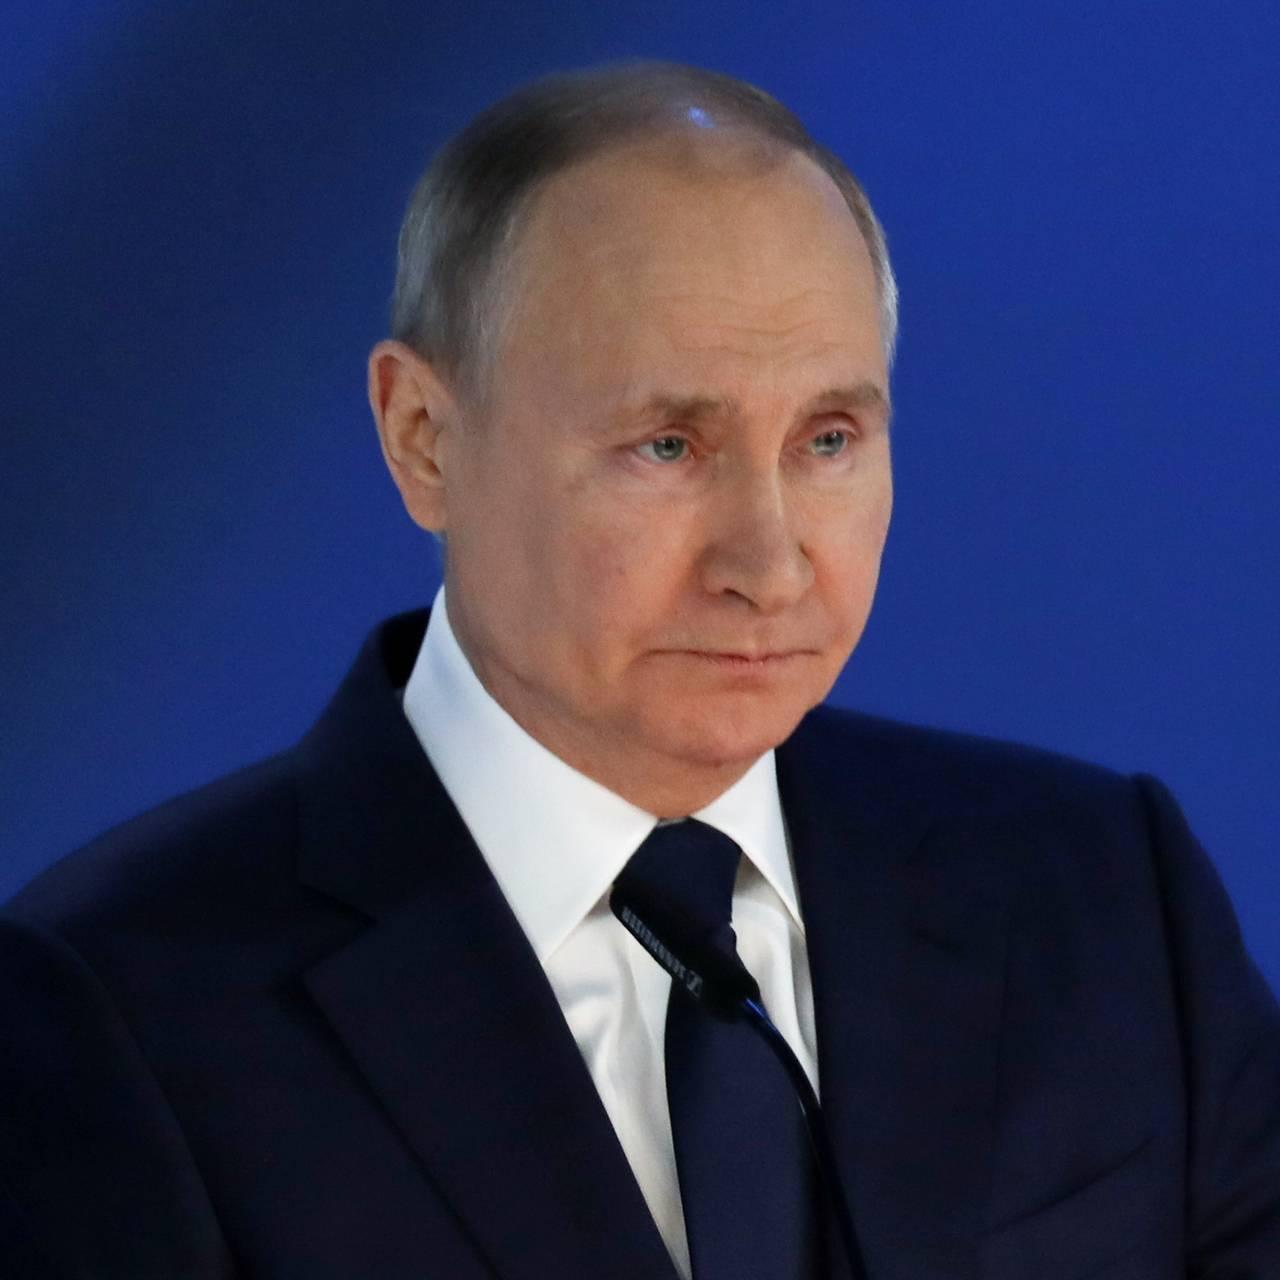 Bilde av Russland